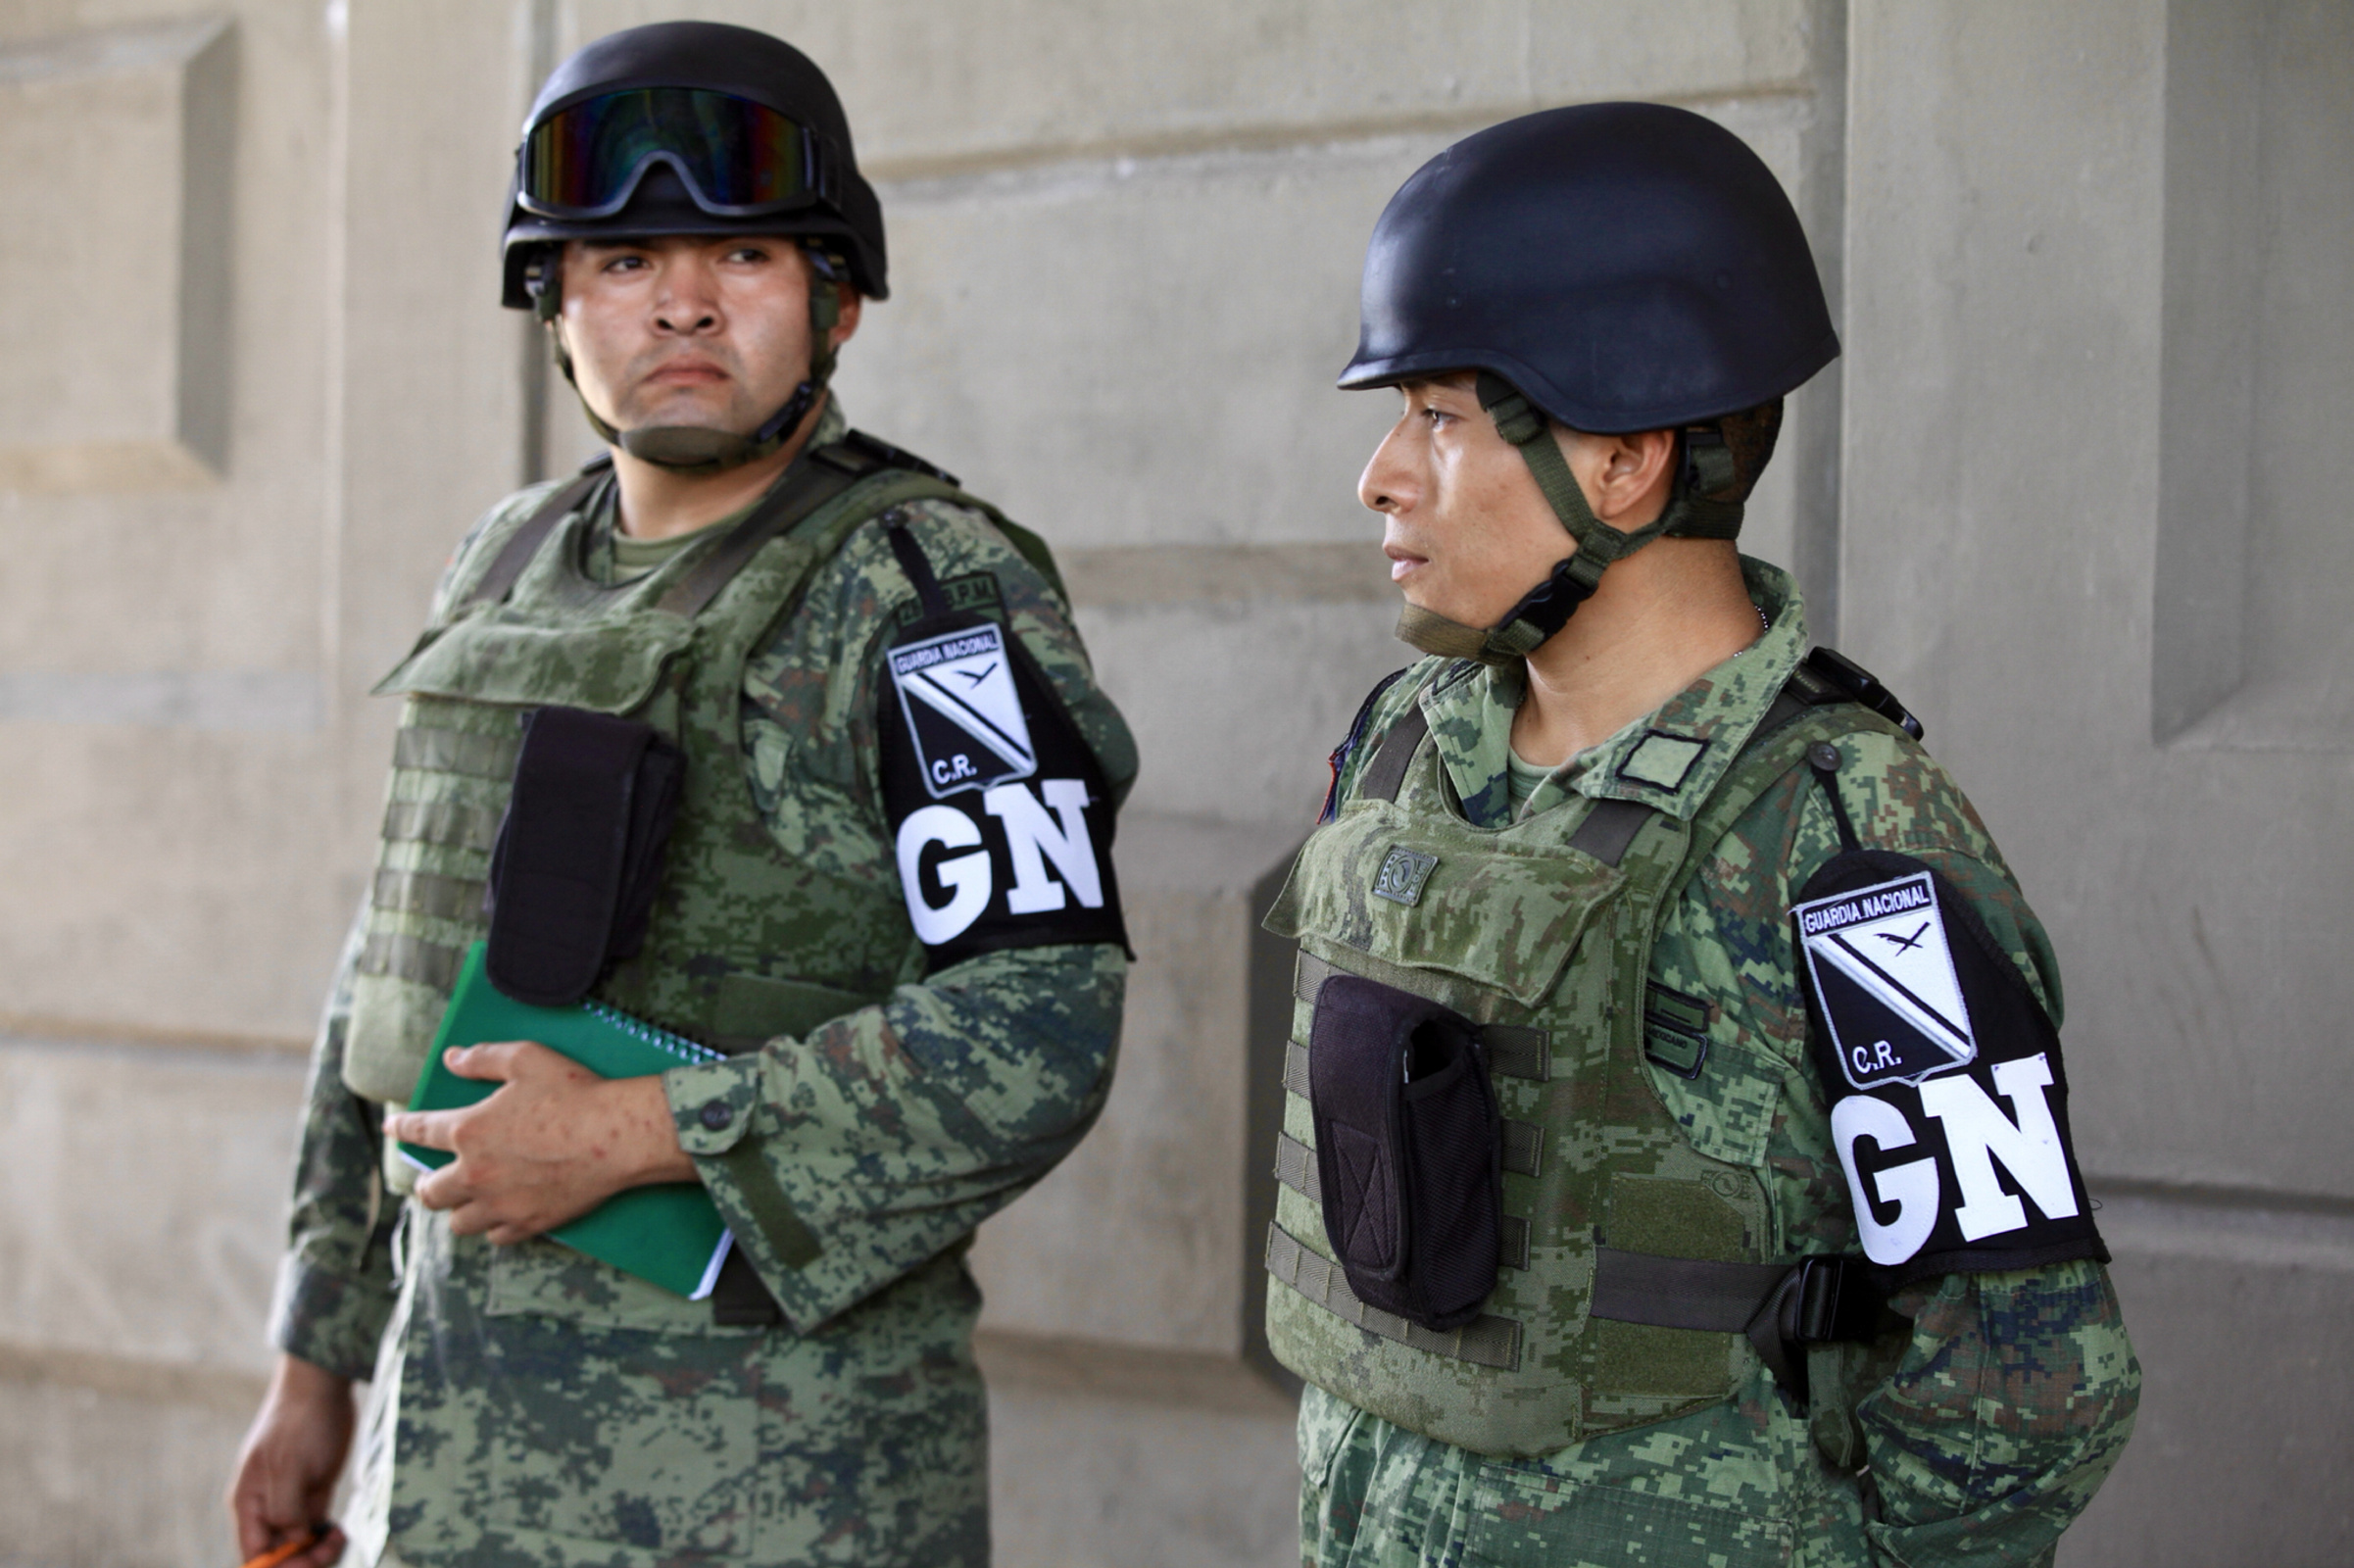 Cancelan construcción de base de la Guardia Nacional en Coatzacoalcos